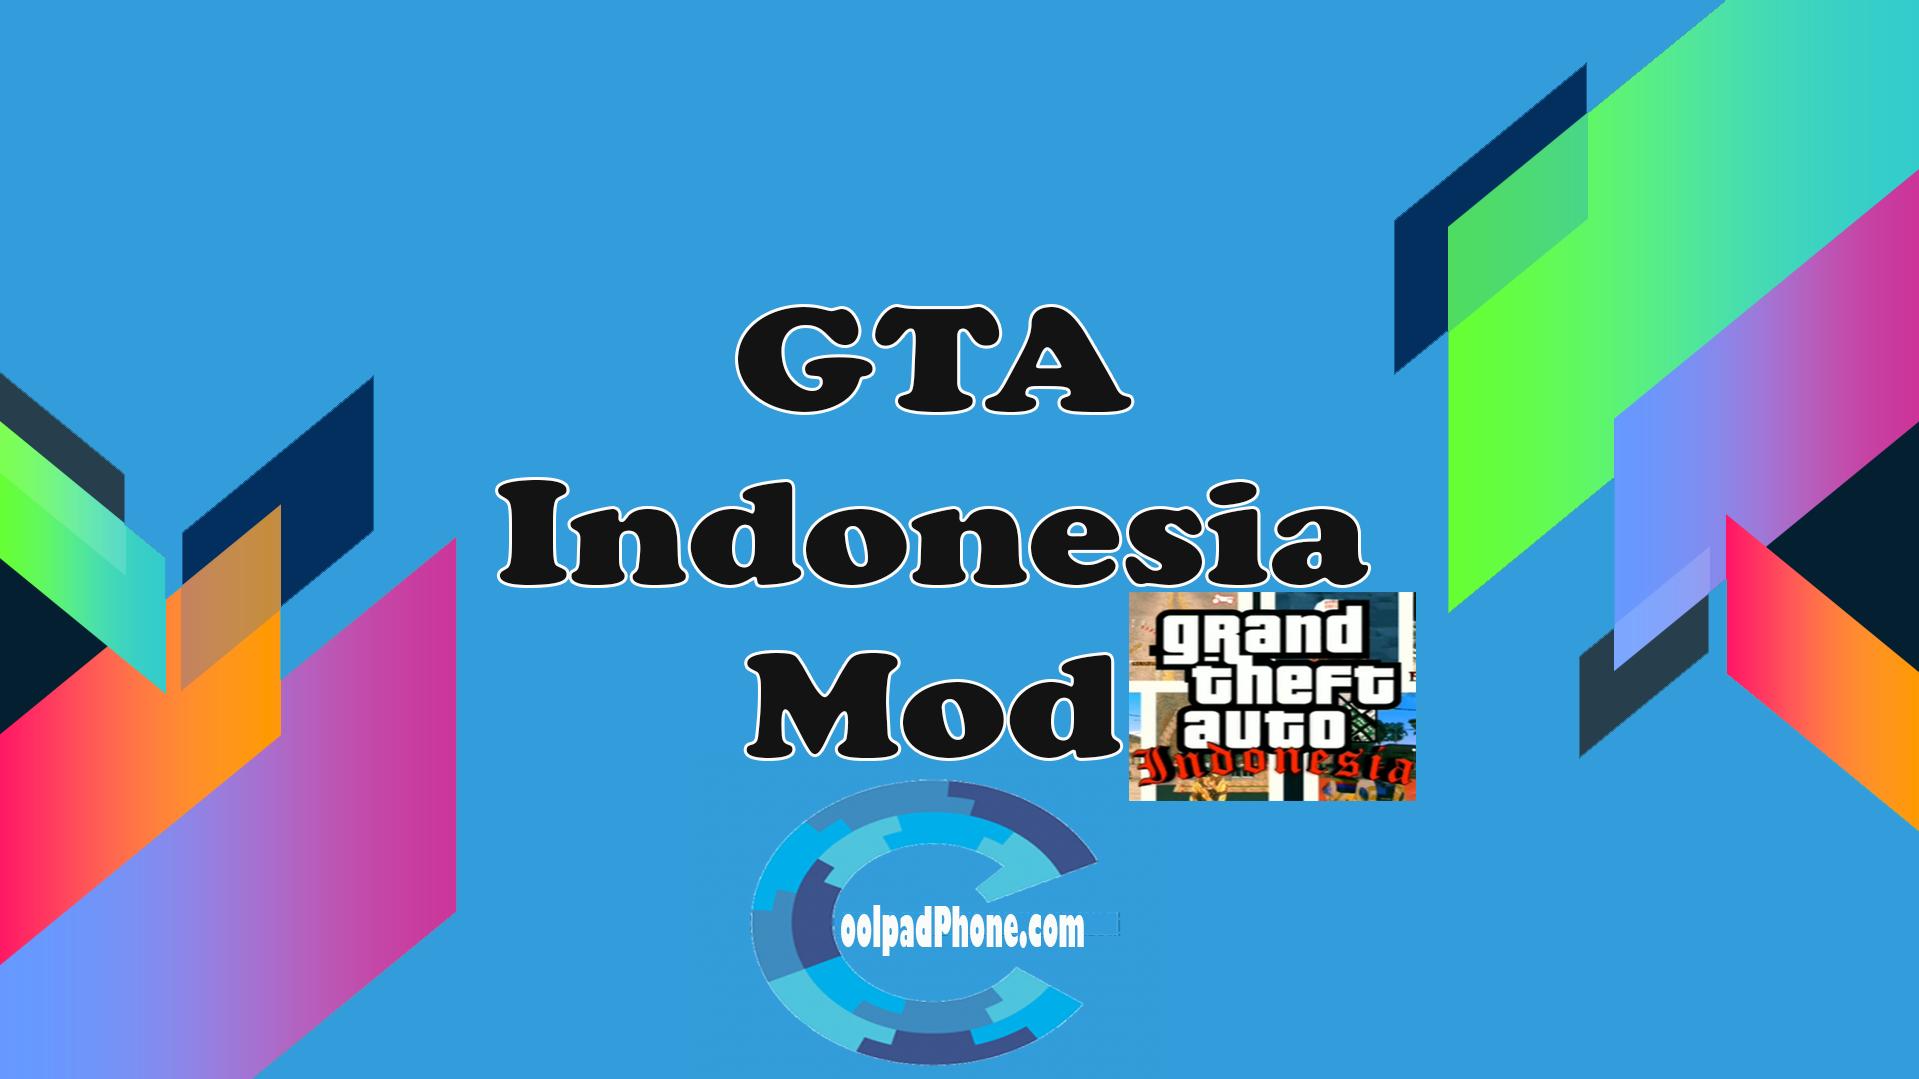 gta-indonesia-mod